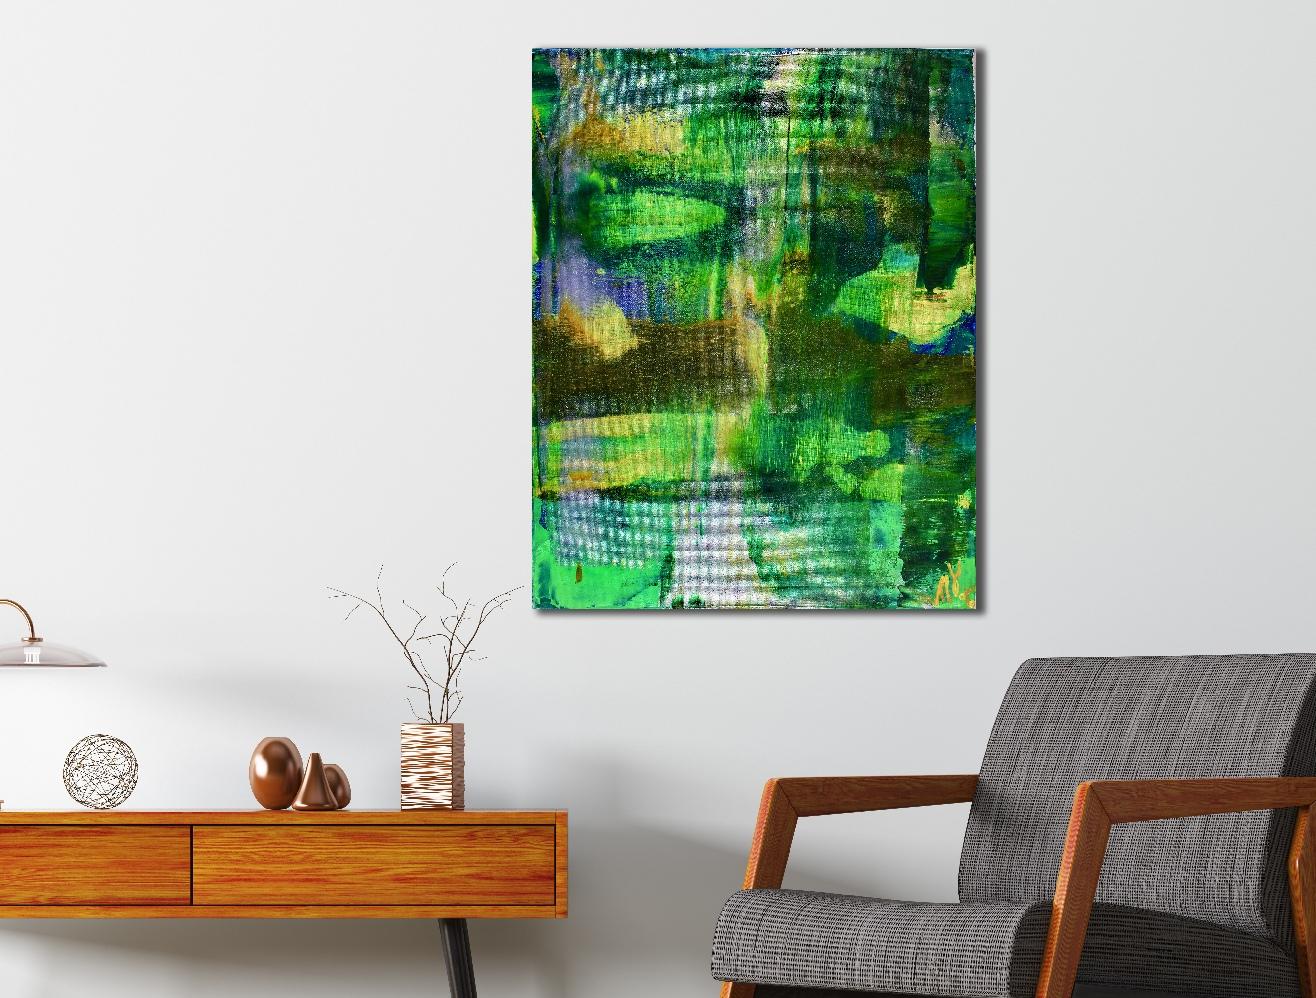 Green Fusion (2018) Acrylic painting by Nestor Toro